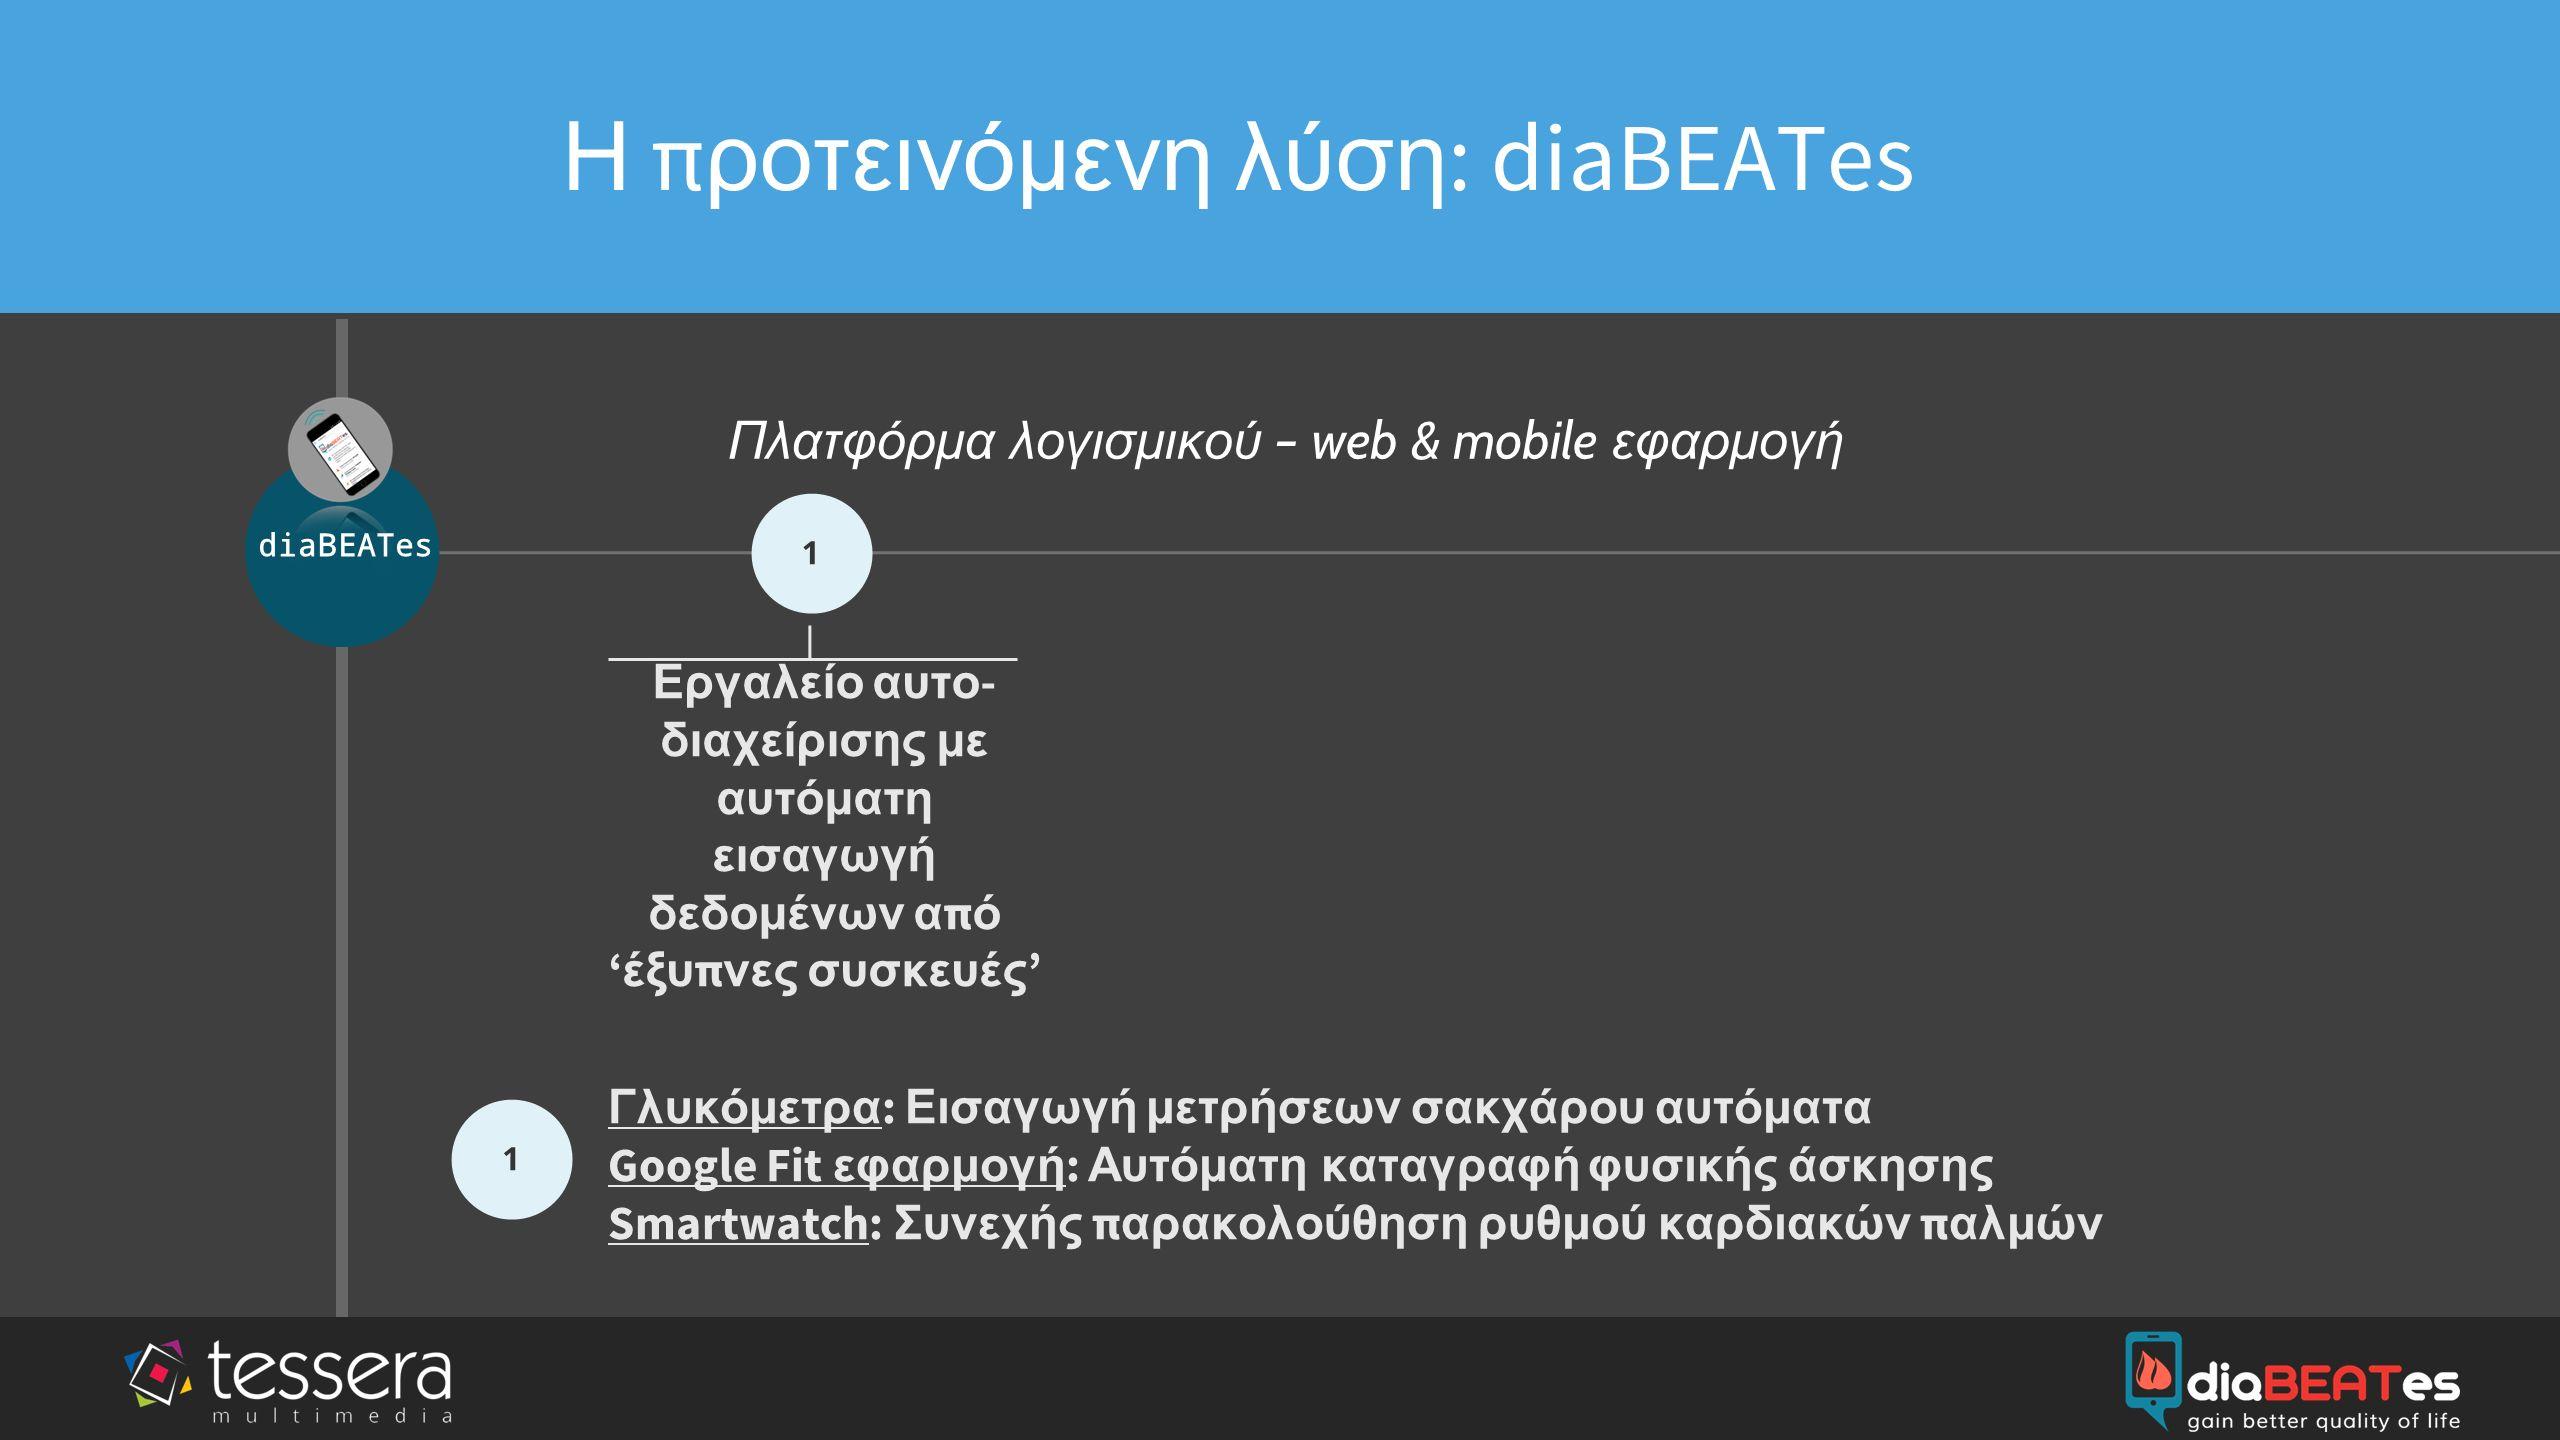 company logo & name Πλατφόρμα λογισμικού – web & mobile εφαρμογή 1 Εργαλείο αυτο - διαχείρισης με αυτόματη εισαγωγή δεδομένων α π ό ' έξυ π νες συσκευές ' 2 ' Σωστική ' εφαρμογή - σε έκτακτη συνθήκη στέλνει ειδο π οιήσεις Η π ροτεινόμενη λύση : diaBEATes diaBEATes Σε συνδυασμό με smartwatch, η εφαρμογή ειδο π οιεί σε π ερί π τωση έκτακτης ανάγκης ( λι π οθυμικό ε π εισόδιο ) π ροκαθορισμένα άτομα για άμεση δράση 2